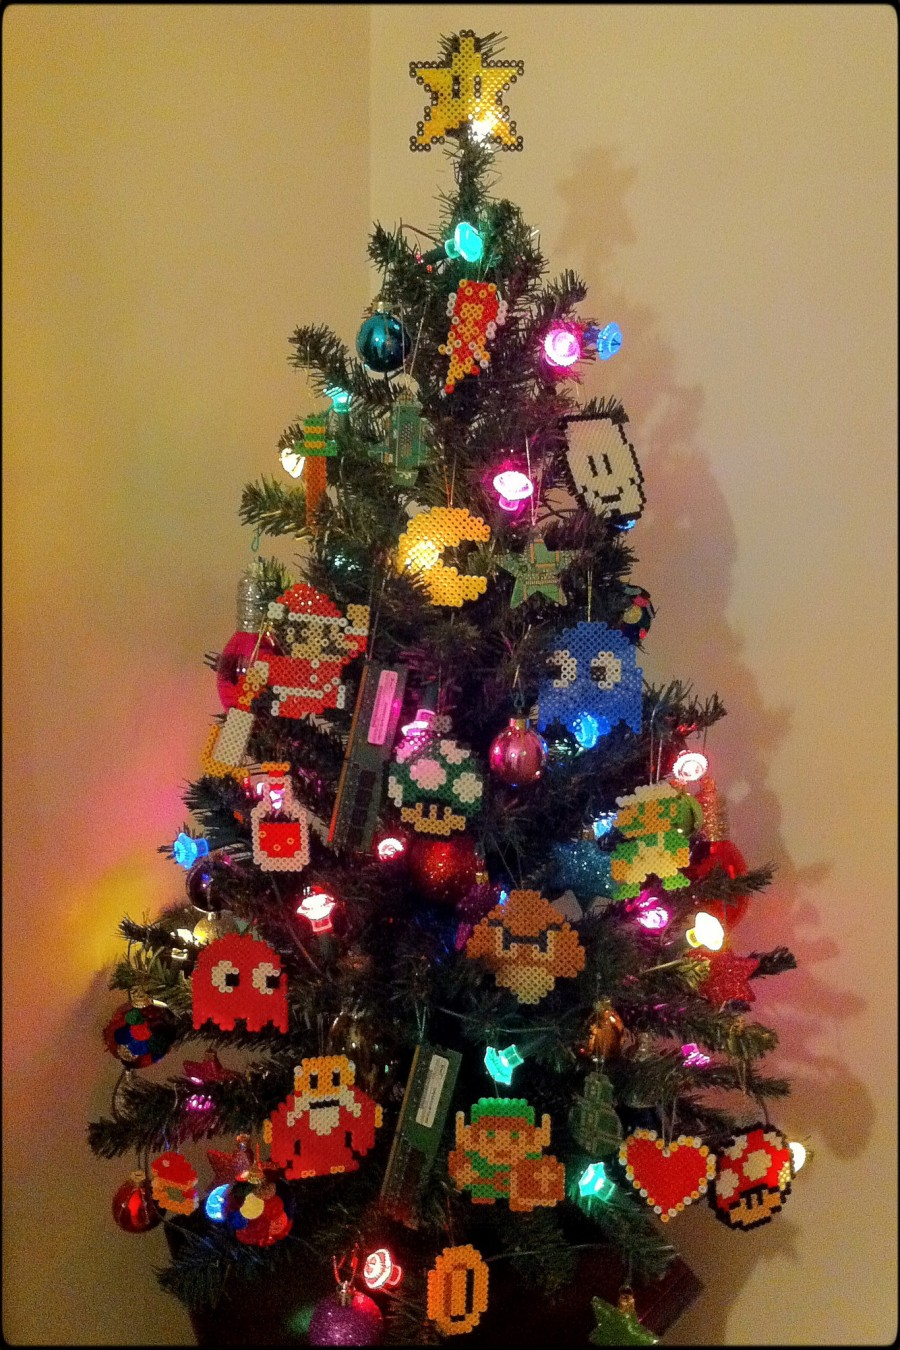 Image from Flickr User: Momou crochet